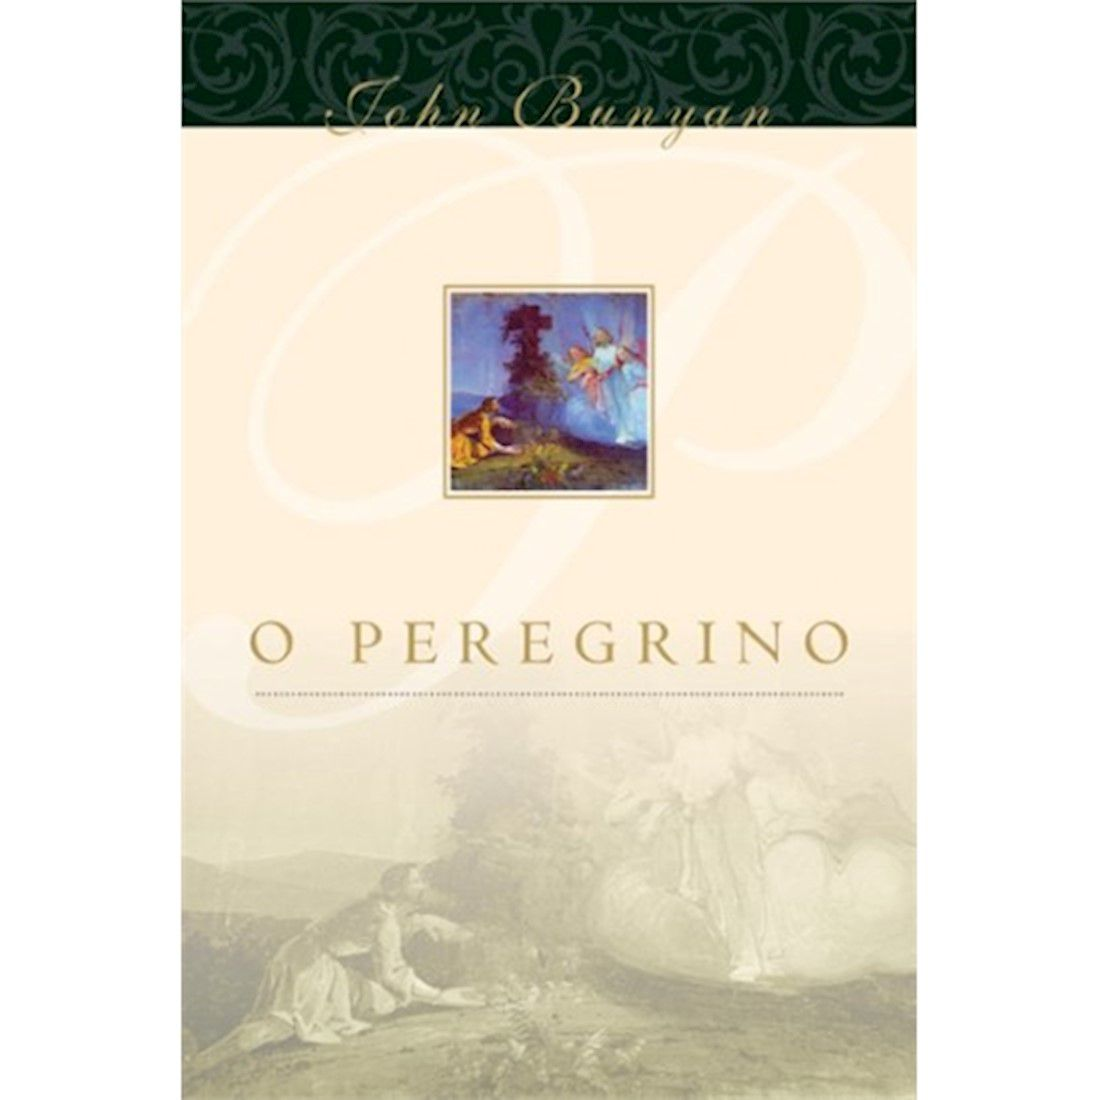 Livro O Peregrino - Brochura